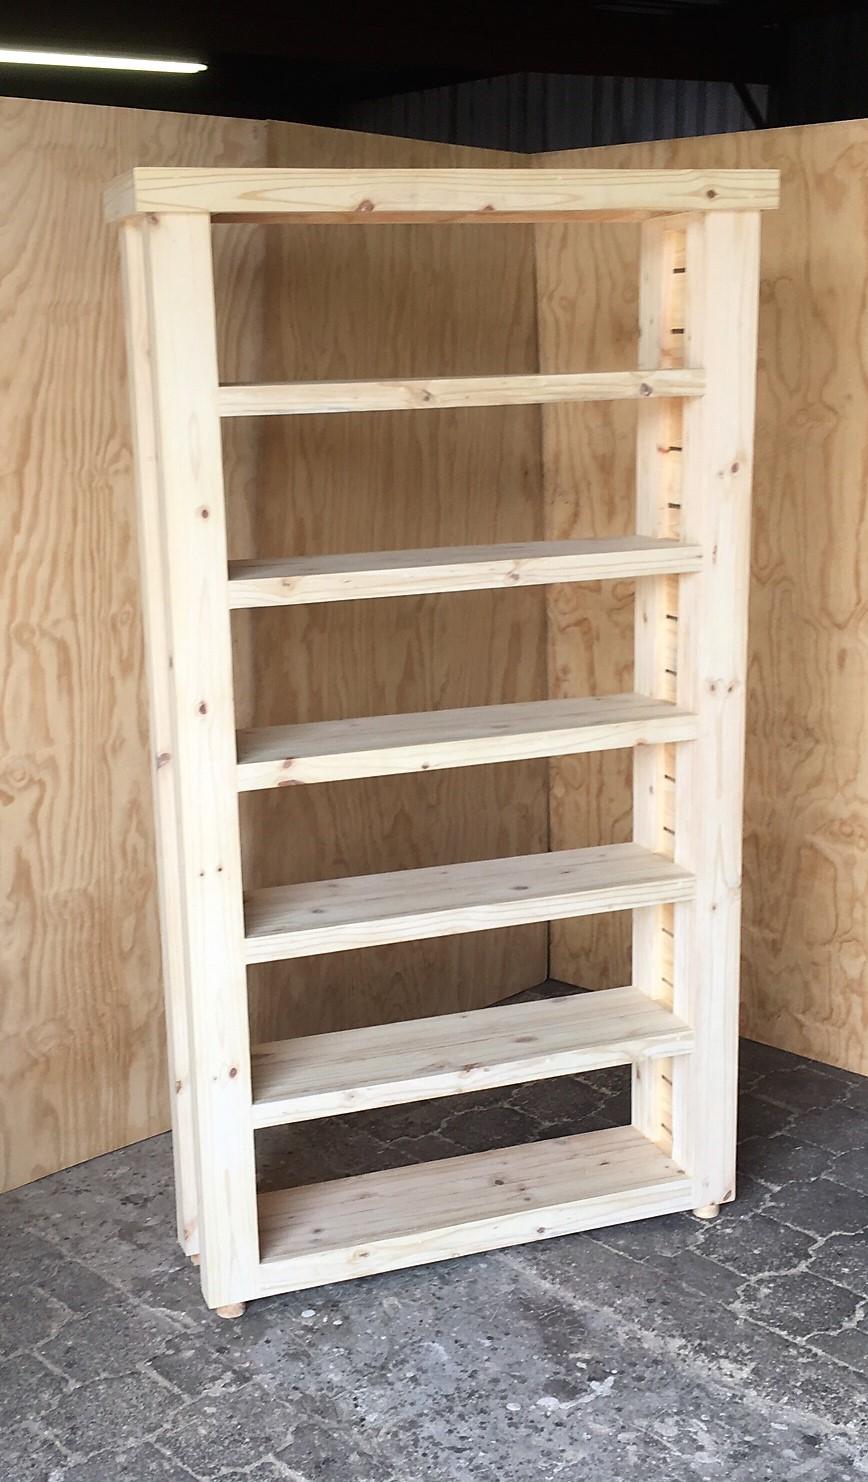 Bookshelf Farmhouse series 1270 Raw